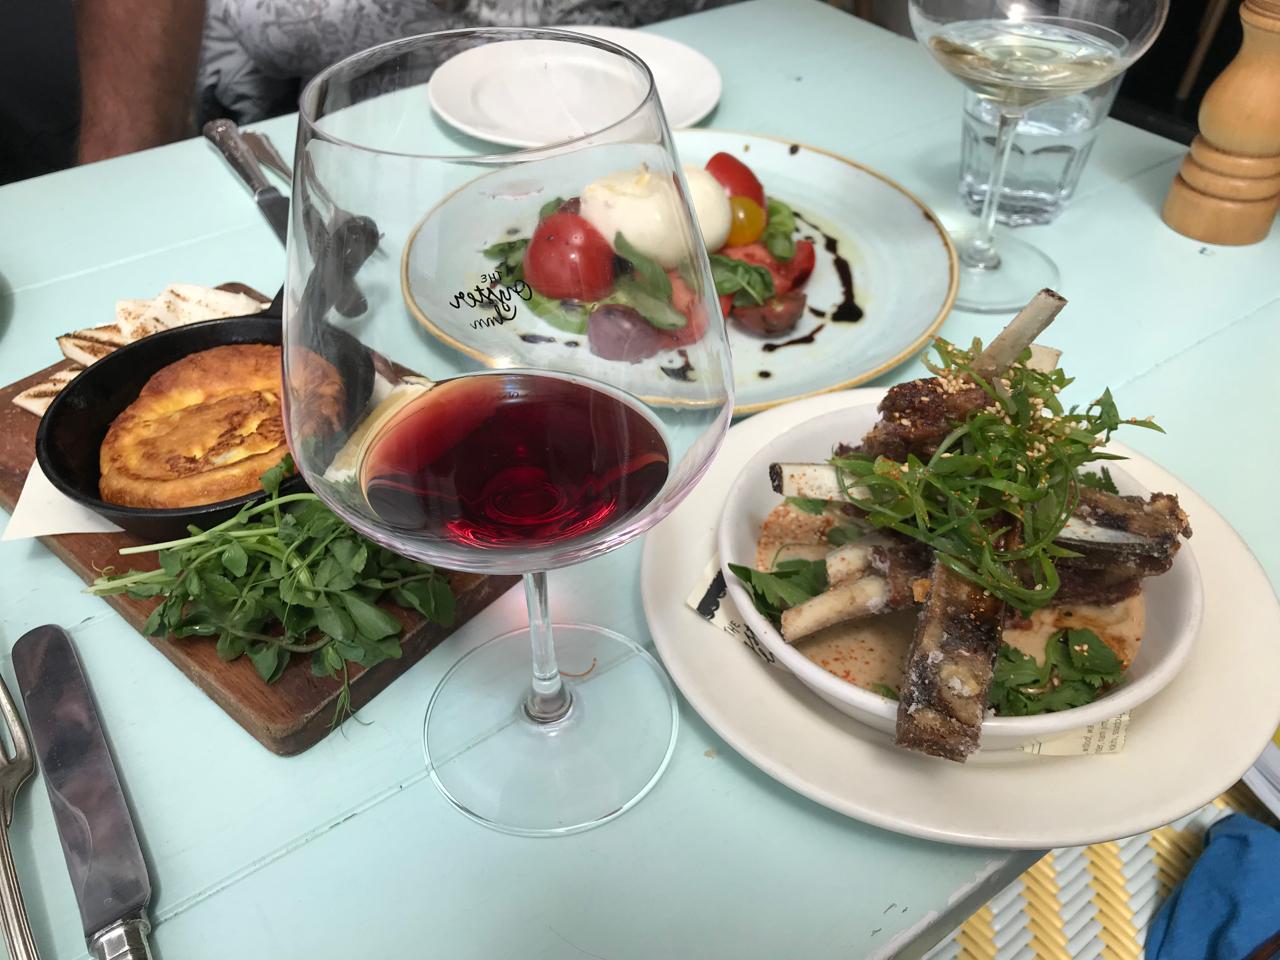 New Zealand Pinot Noir and New Zealand lamb. No more explanation necessary.